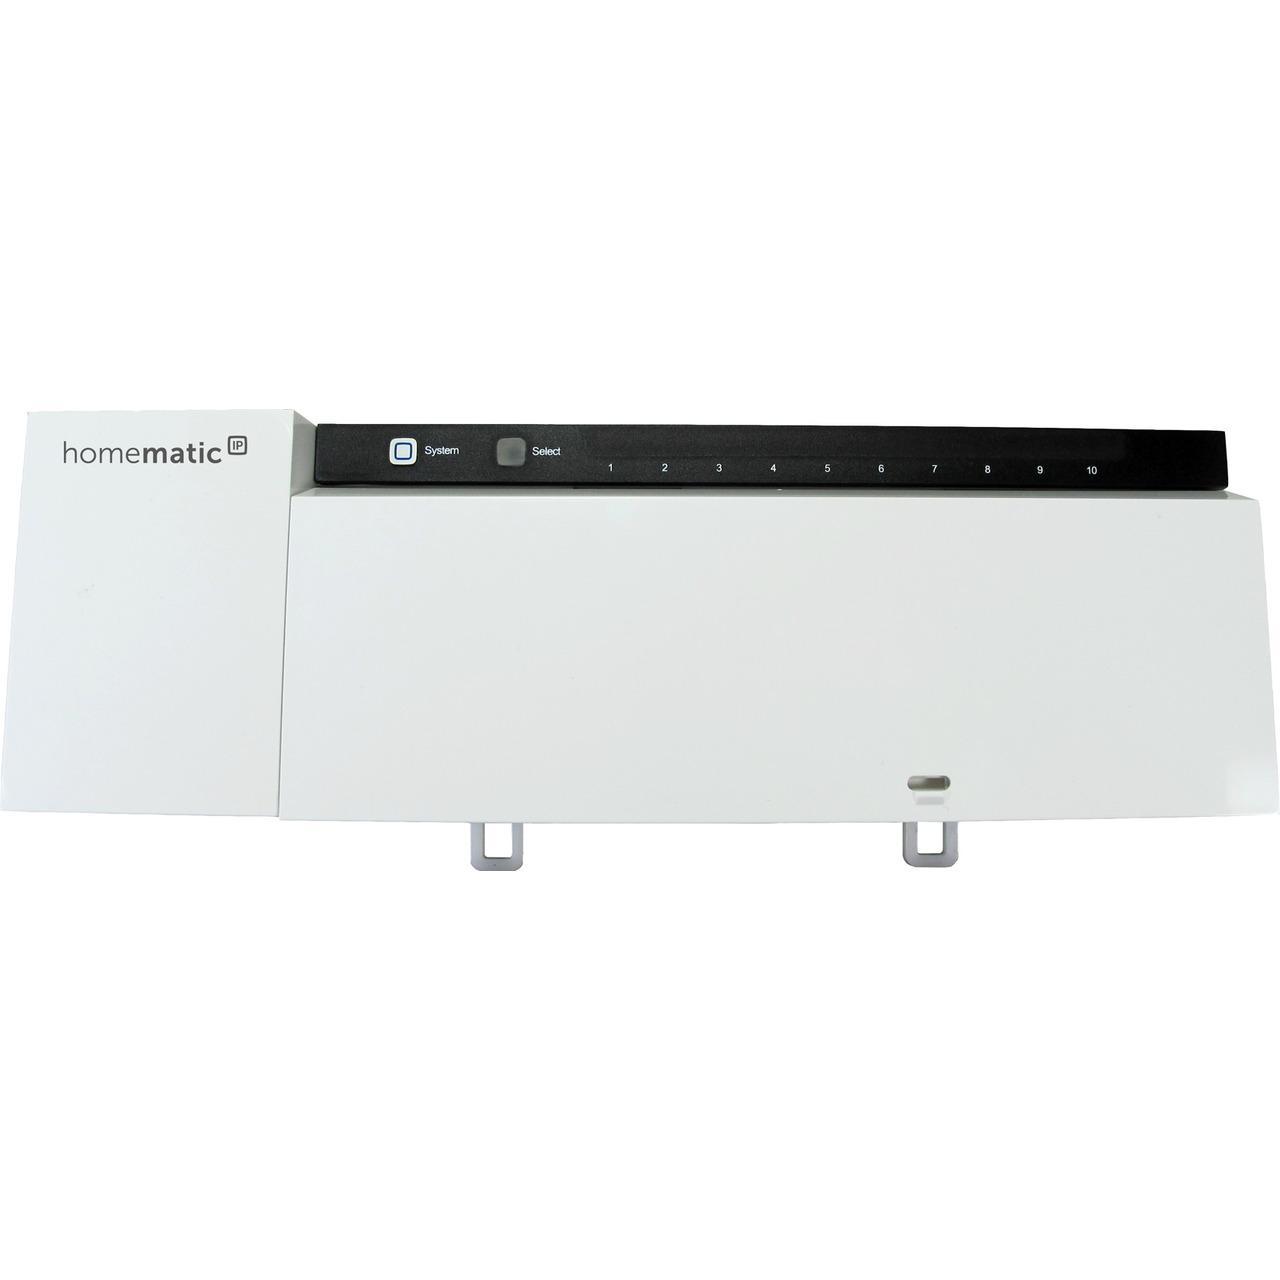 Homematic IP Smart Home Fußbodenheizungsaktor HmIP-FAL230-C10 – 10fach, 230 V